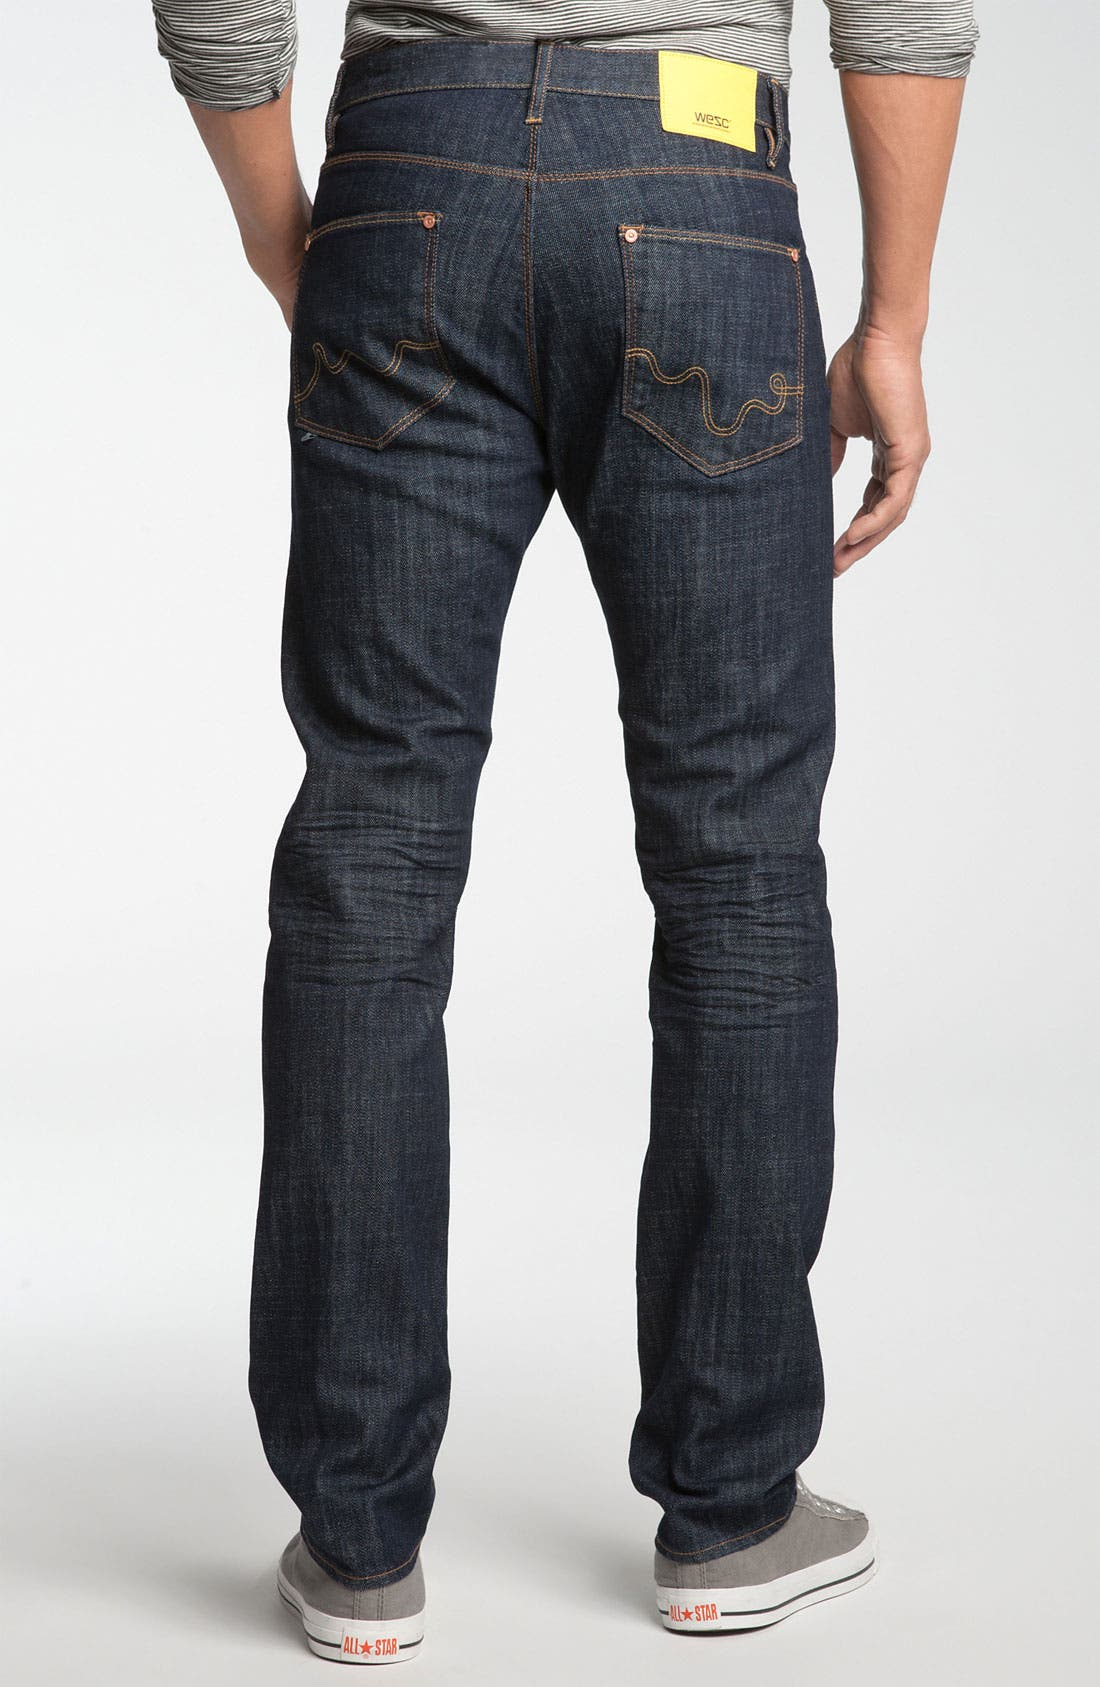 Main Image - WeSC 'Eddy' Slim Fit Jeans (Bright)